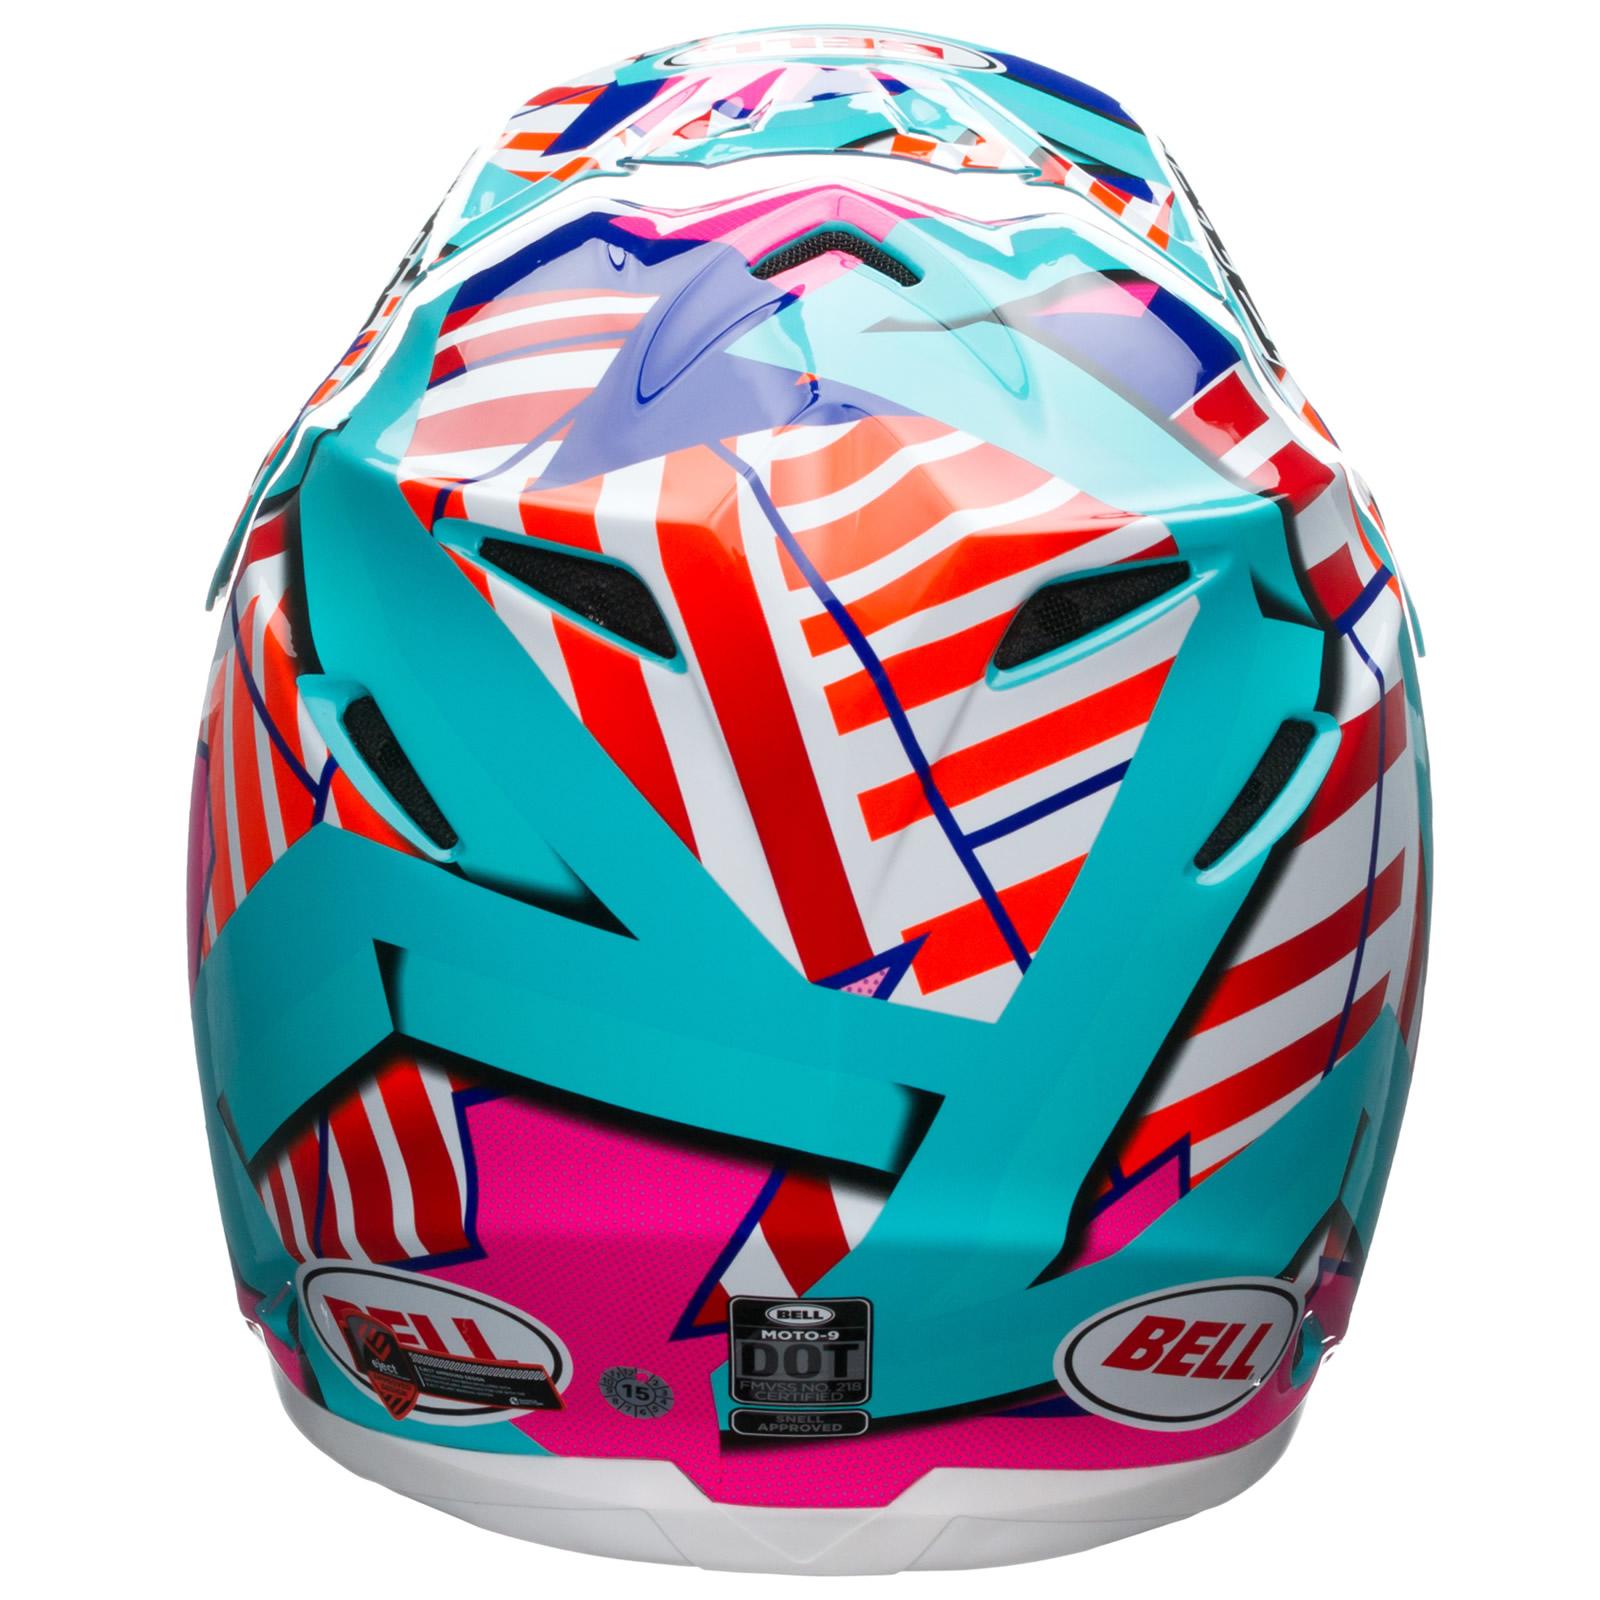 bell moto 9 tagger trouble motocross helmet dot approved mx atv off road ebay. Black Bedroom Furniture Sets. Home Design Ideas